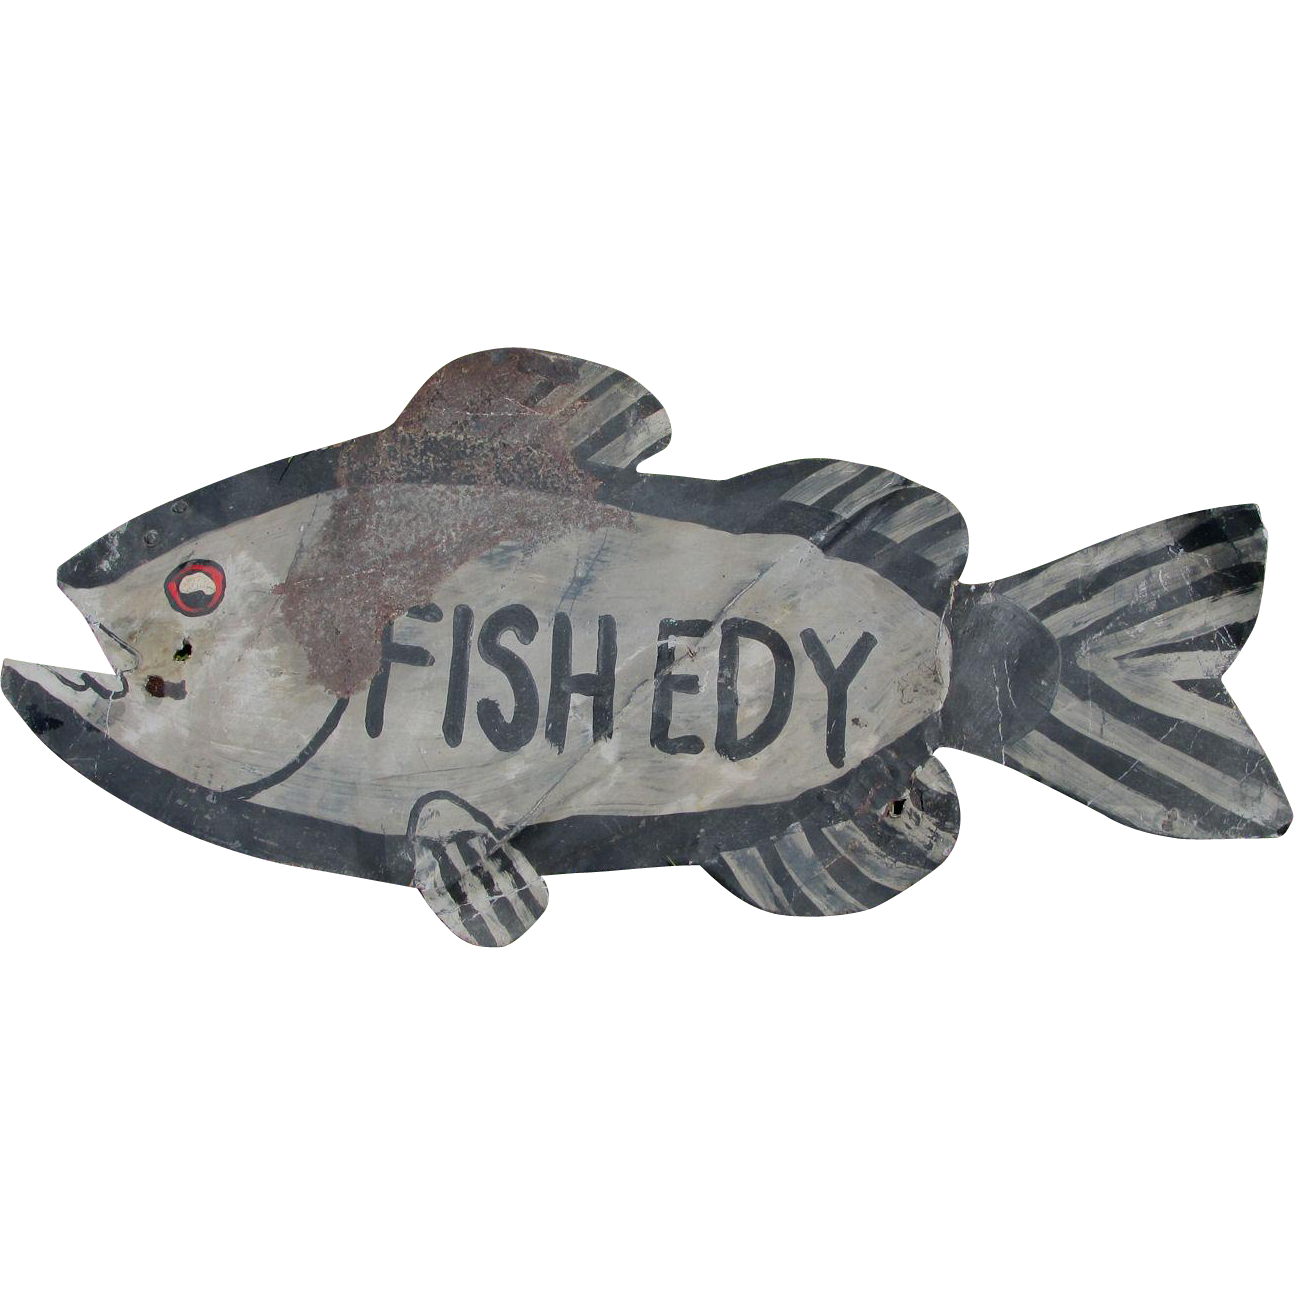 Neat c1920-30s Tin Folk Art Fish Edy Sign in Original Paint